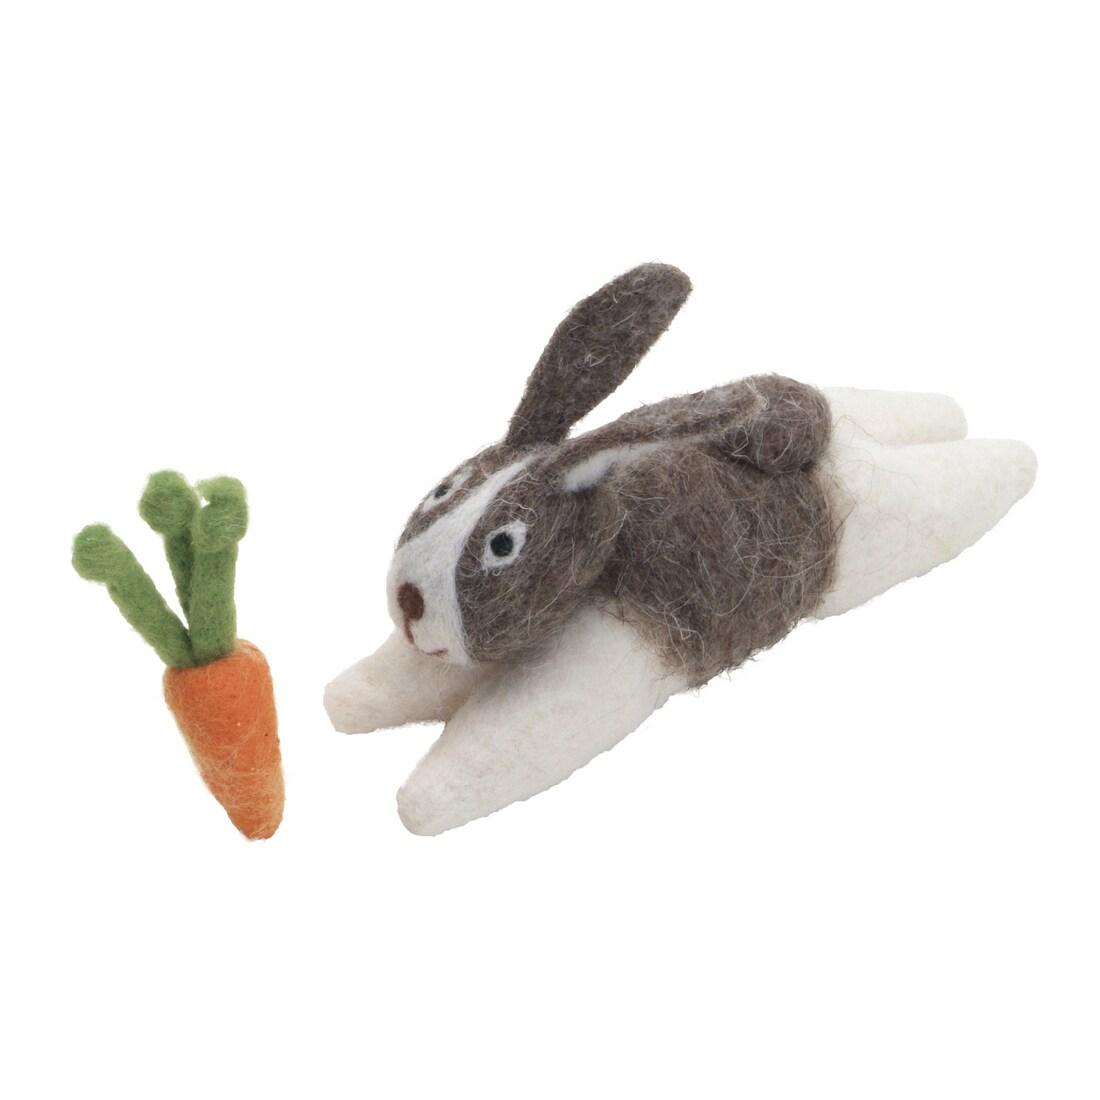 "Coastal Pet Rascals Handcrafted Wool Kicker Cat Toy (7.5""..."